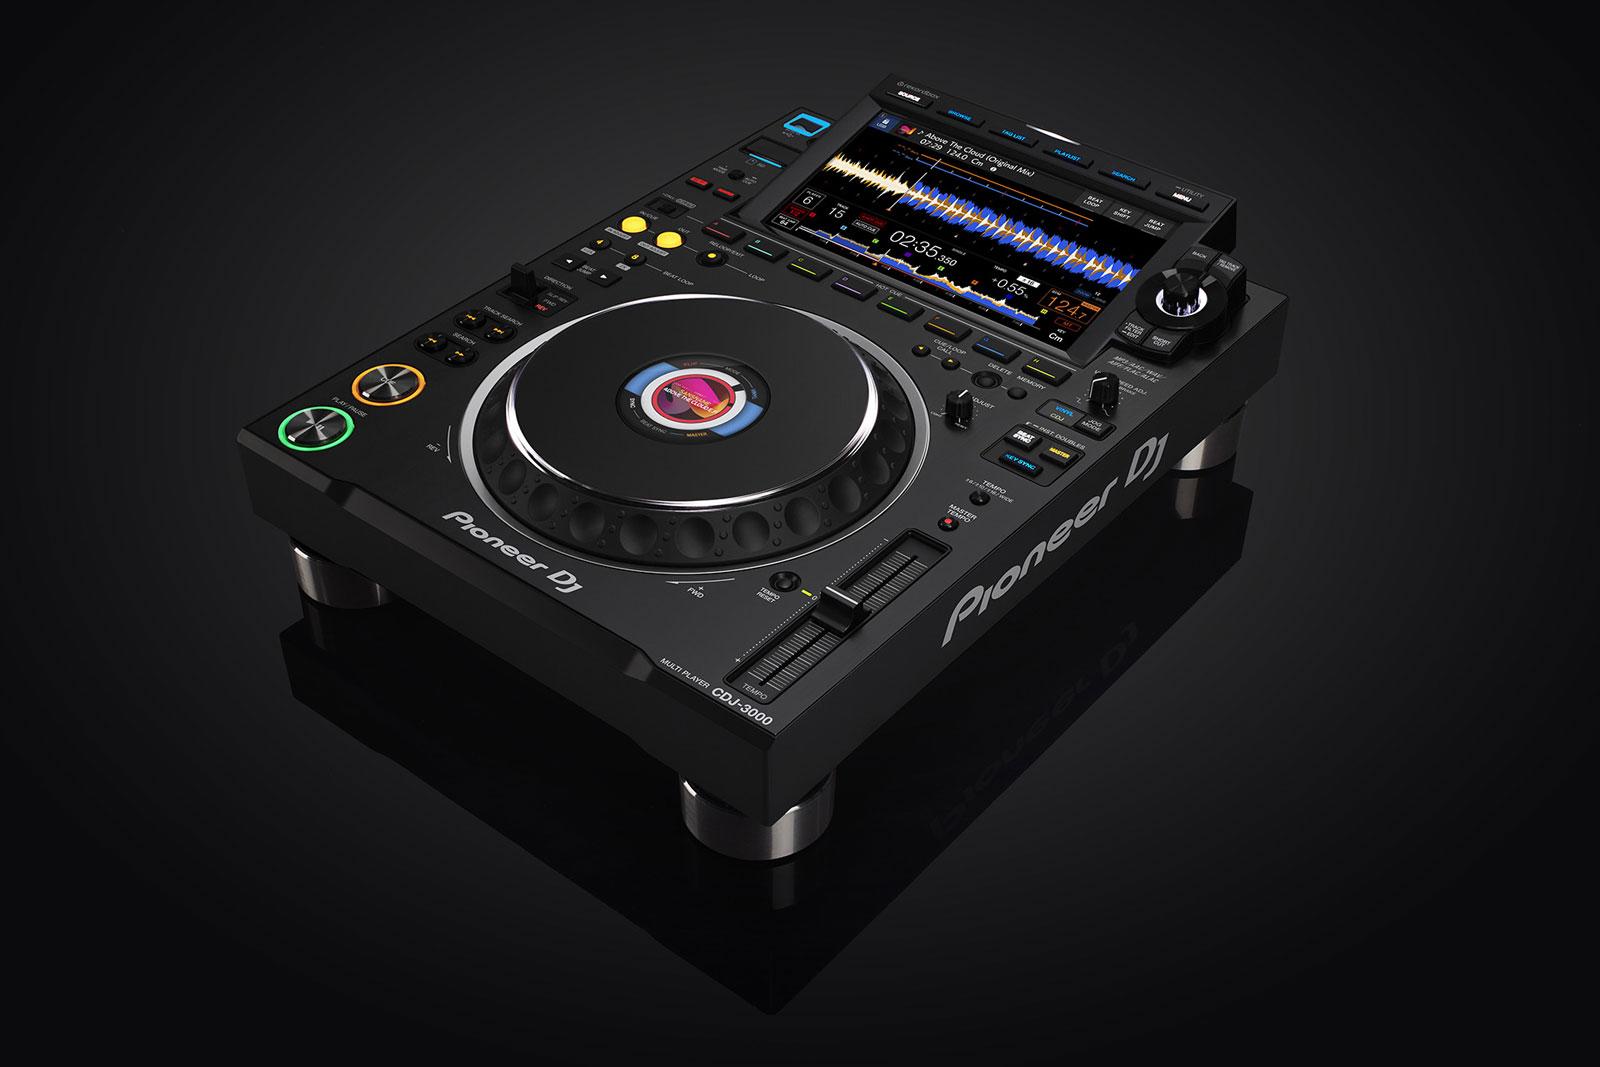 La nouvelle platine CDJ-3000 de Pioneer DJ vient de sortir